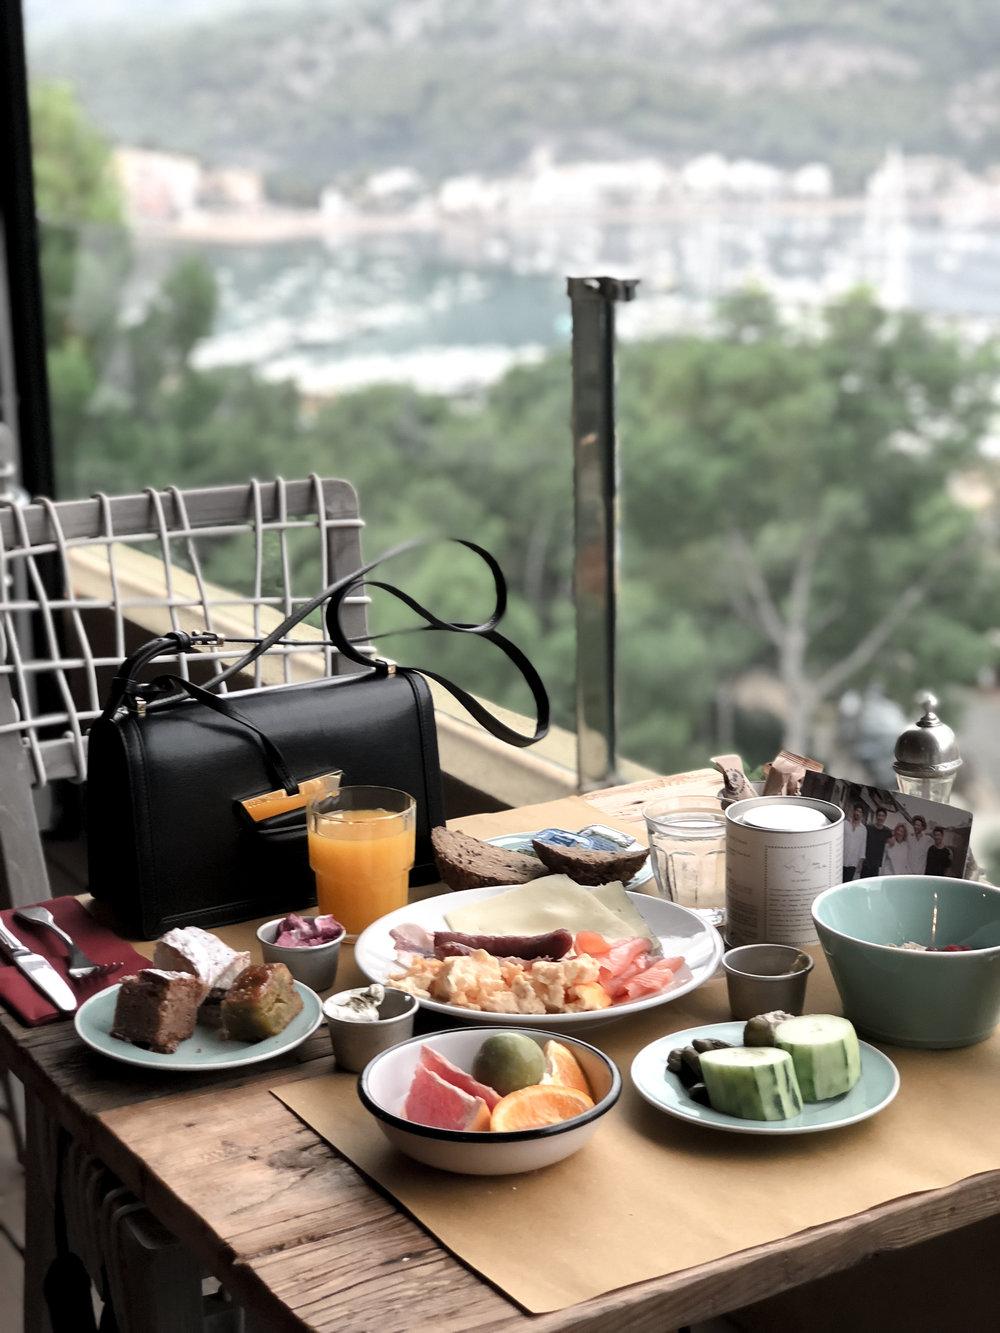 breakfast banquet - with an israeli twist from the neni kitchen